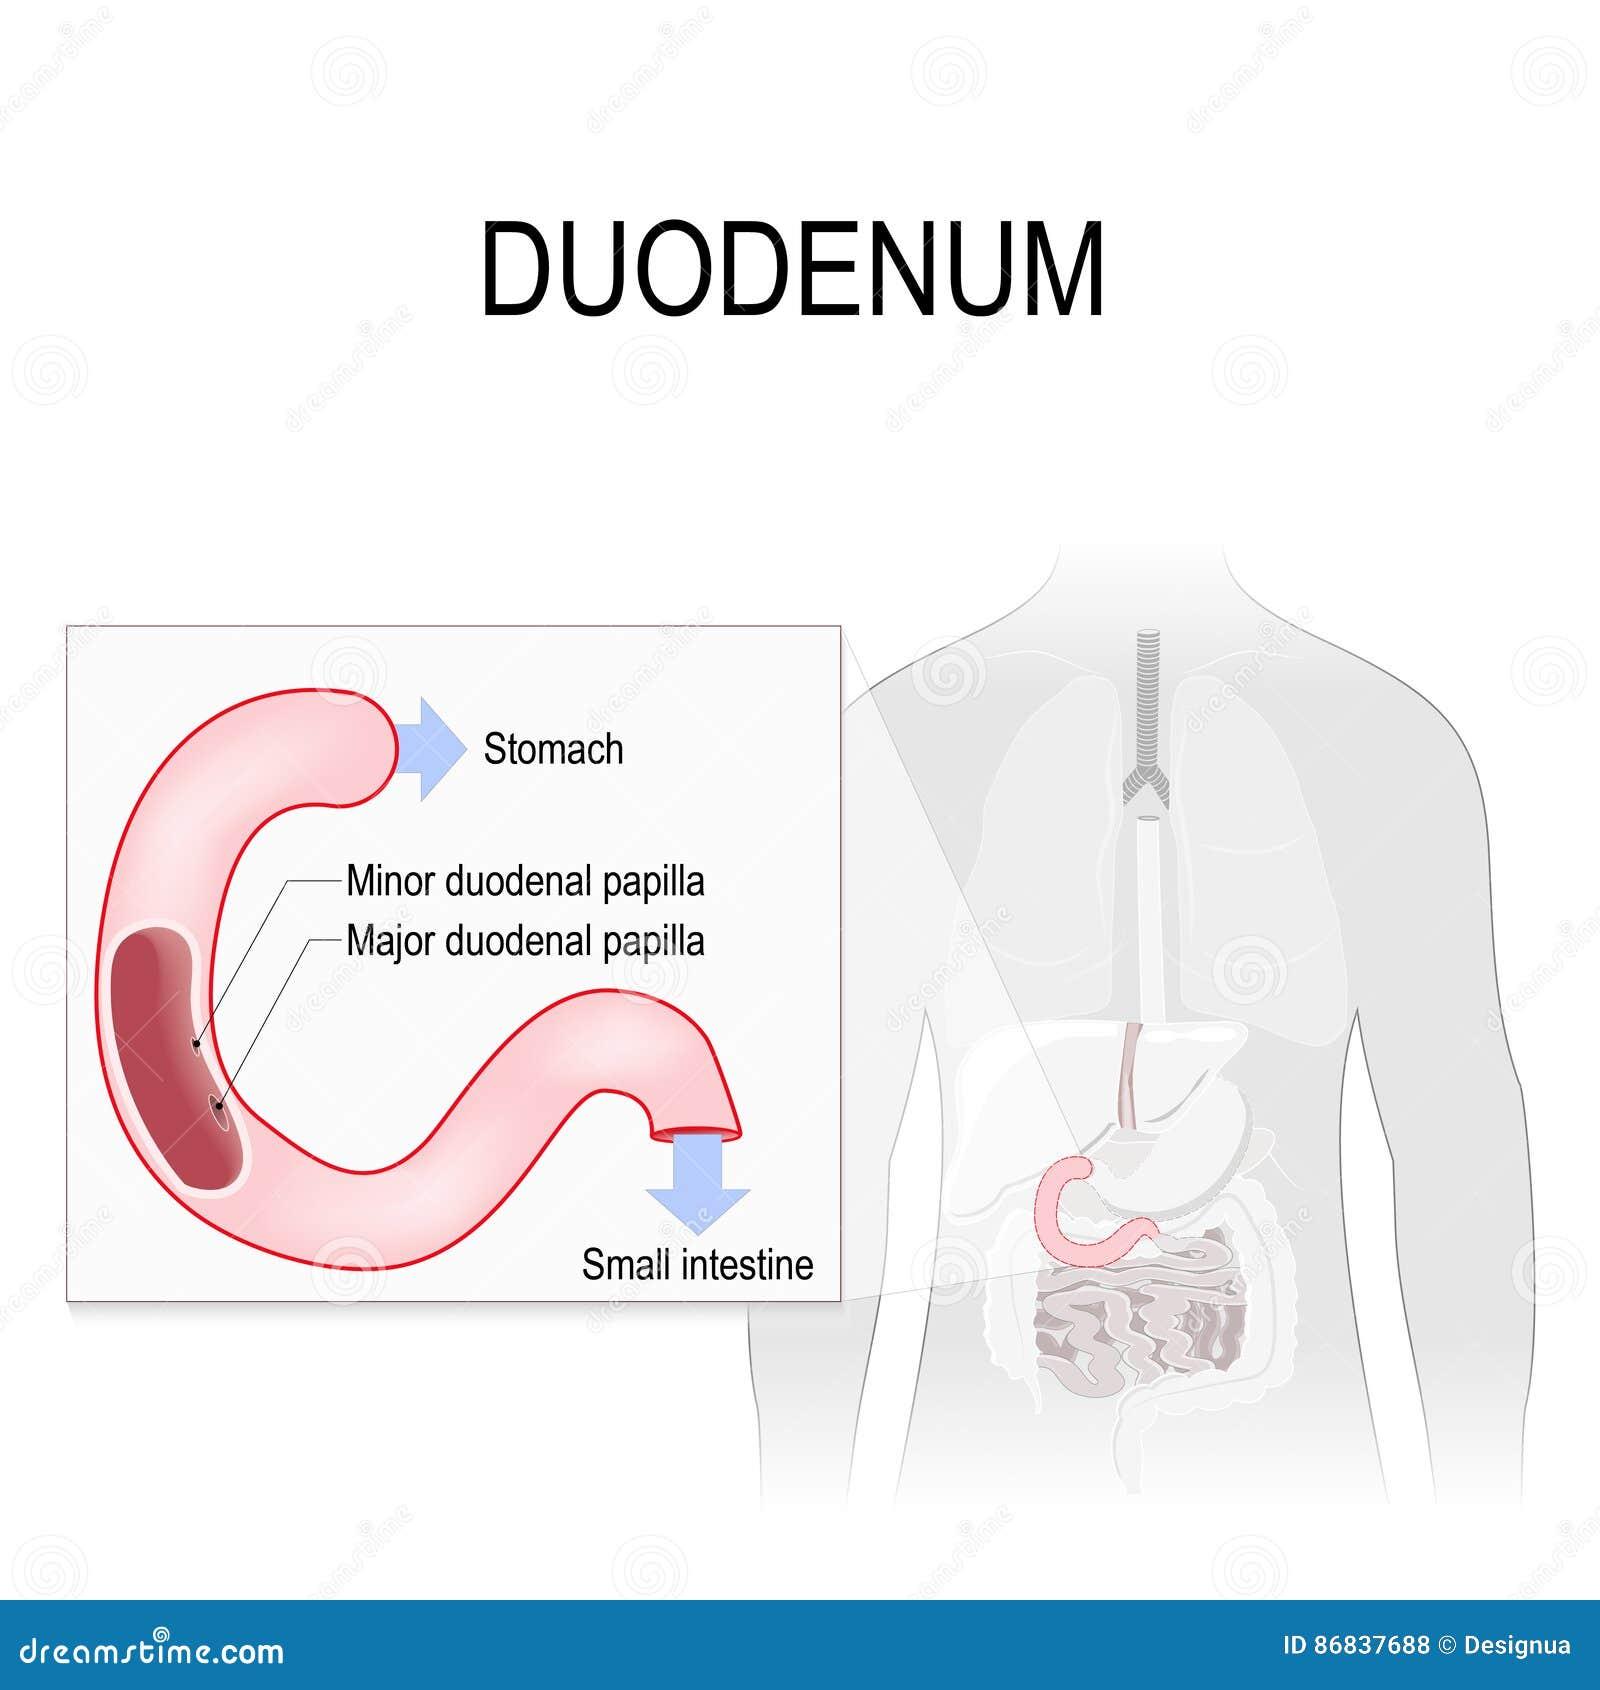 Duodenum stock vector. Illustration of duodenal, appendix - 86837688